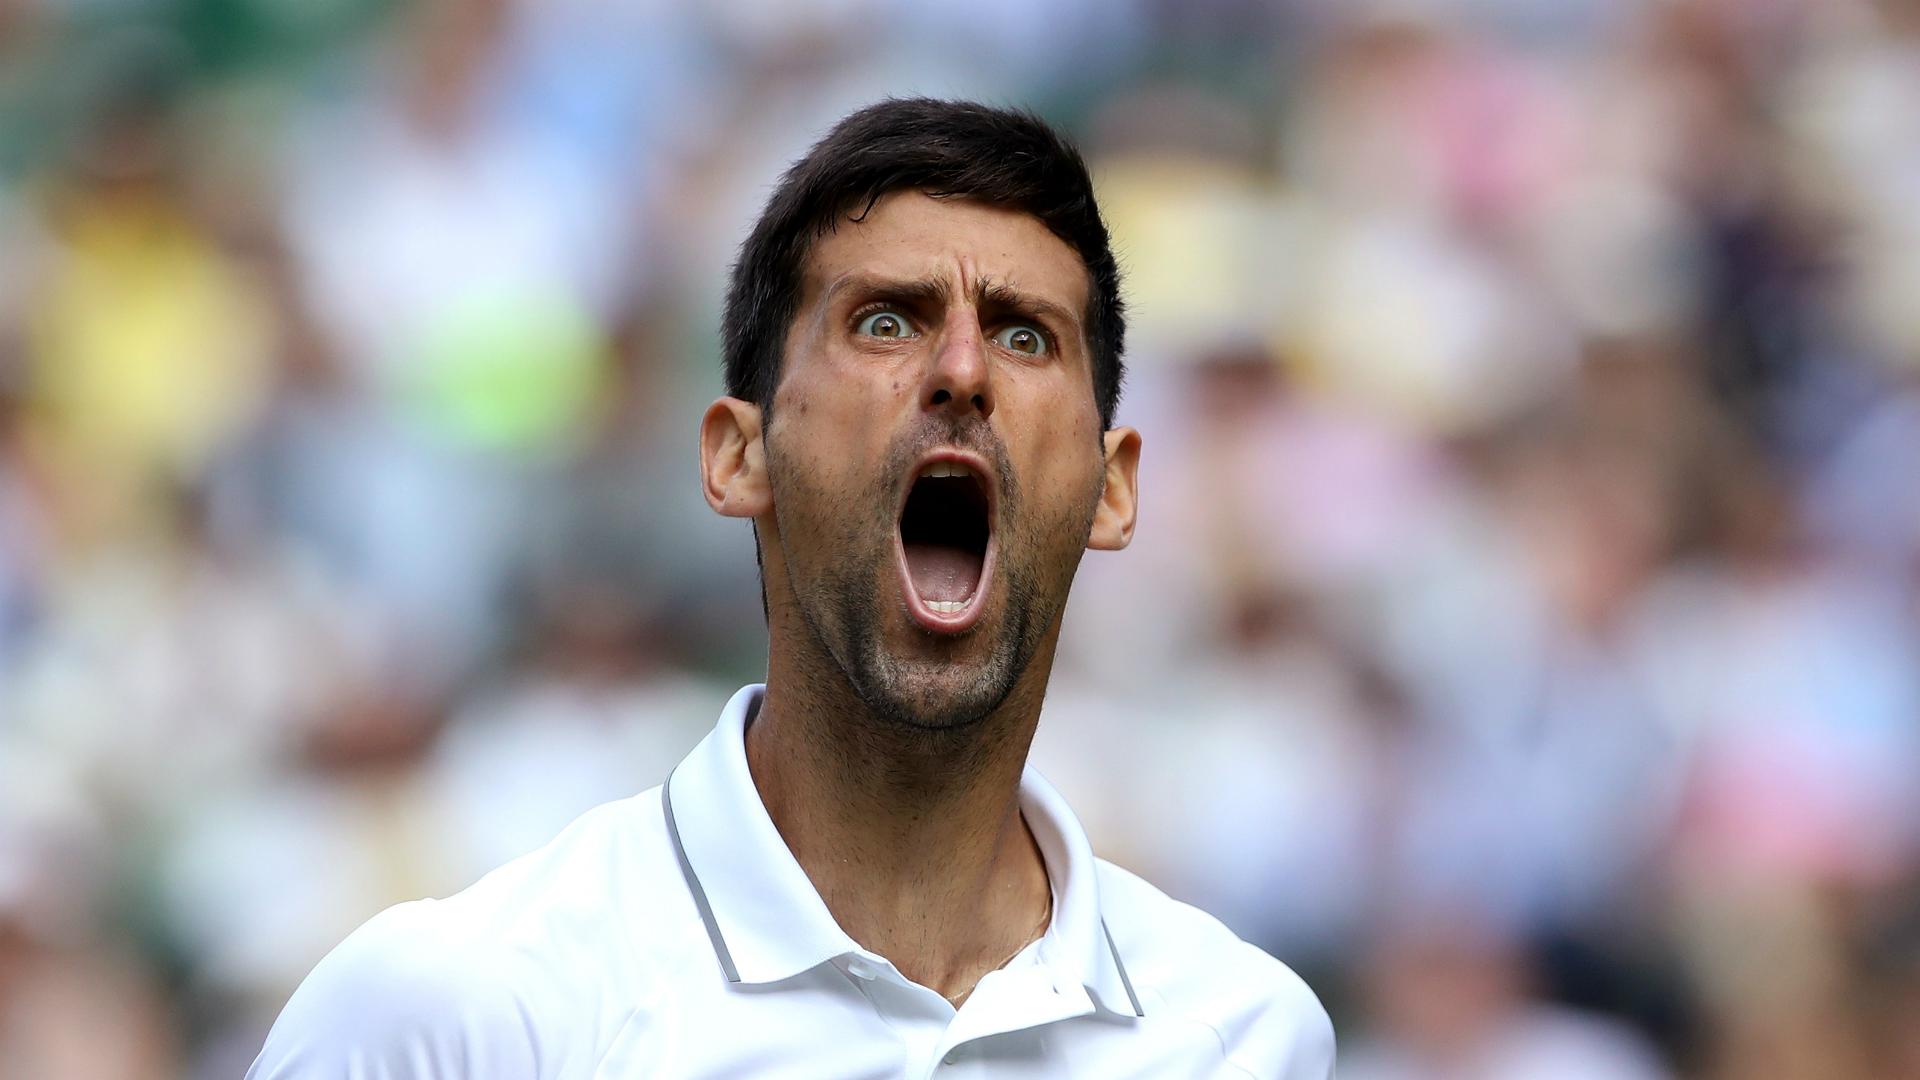 Novak Djokovic insisted reaching a sixth Wimbledon final still gave him a big thrill after beating Roberto Bautista Agut on Centre Court.